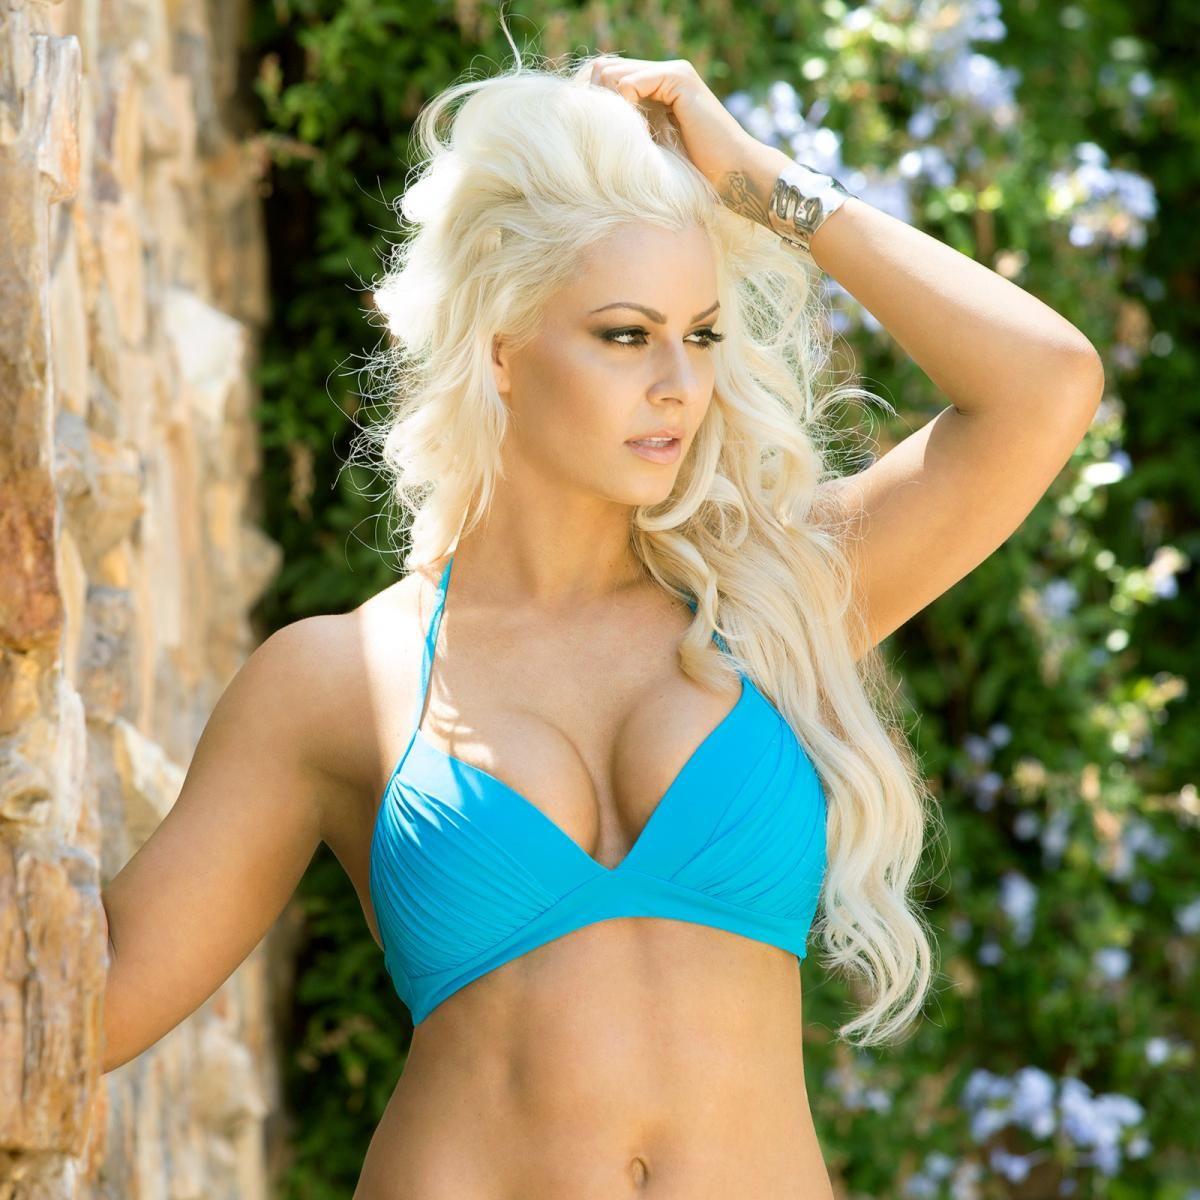 Bikini Maryse Ouellet nude photos 2019